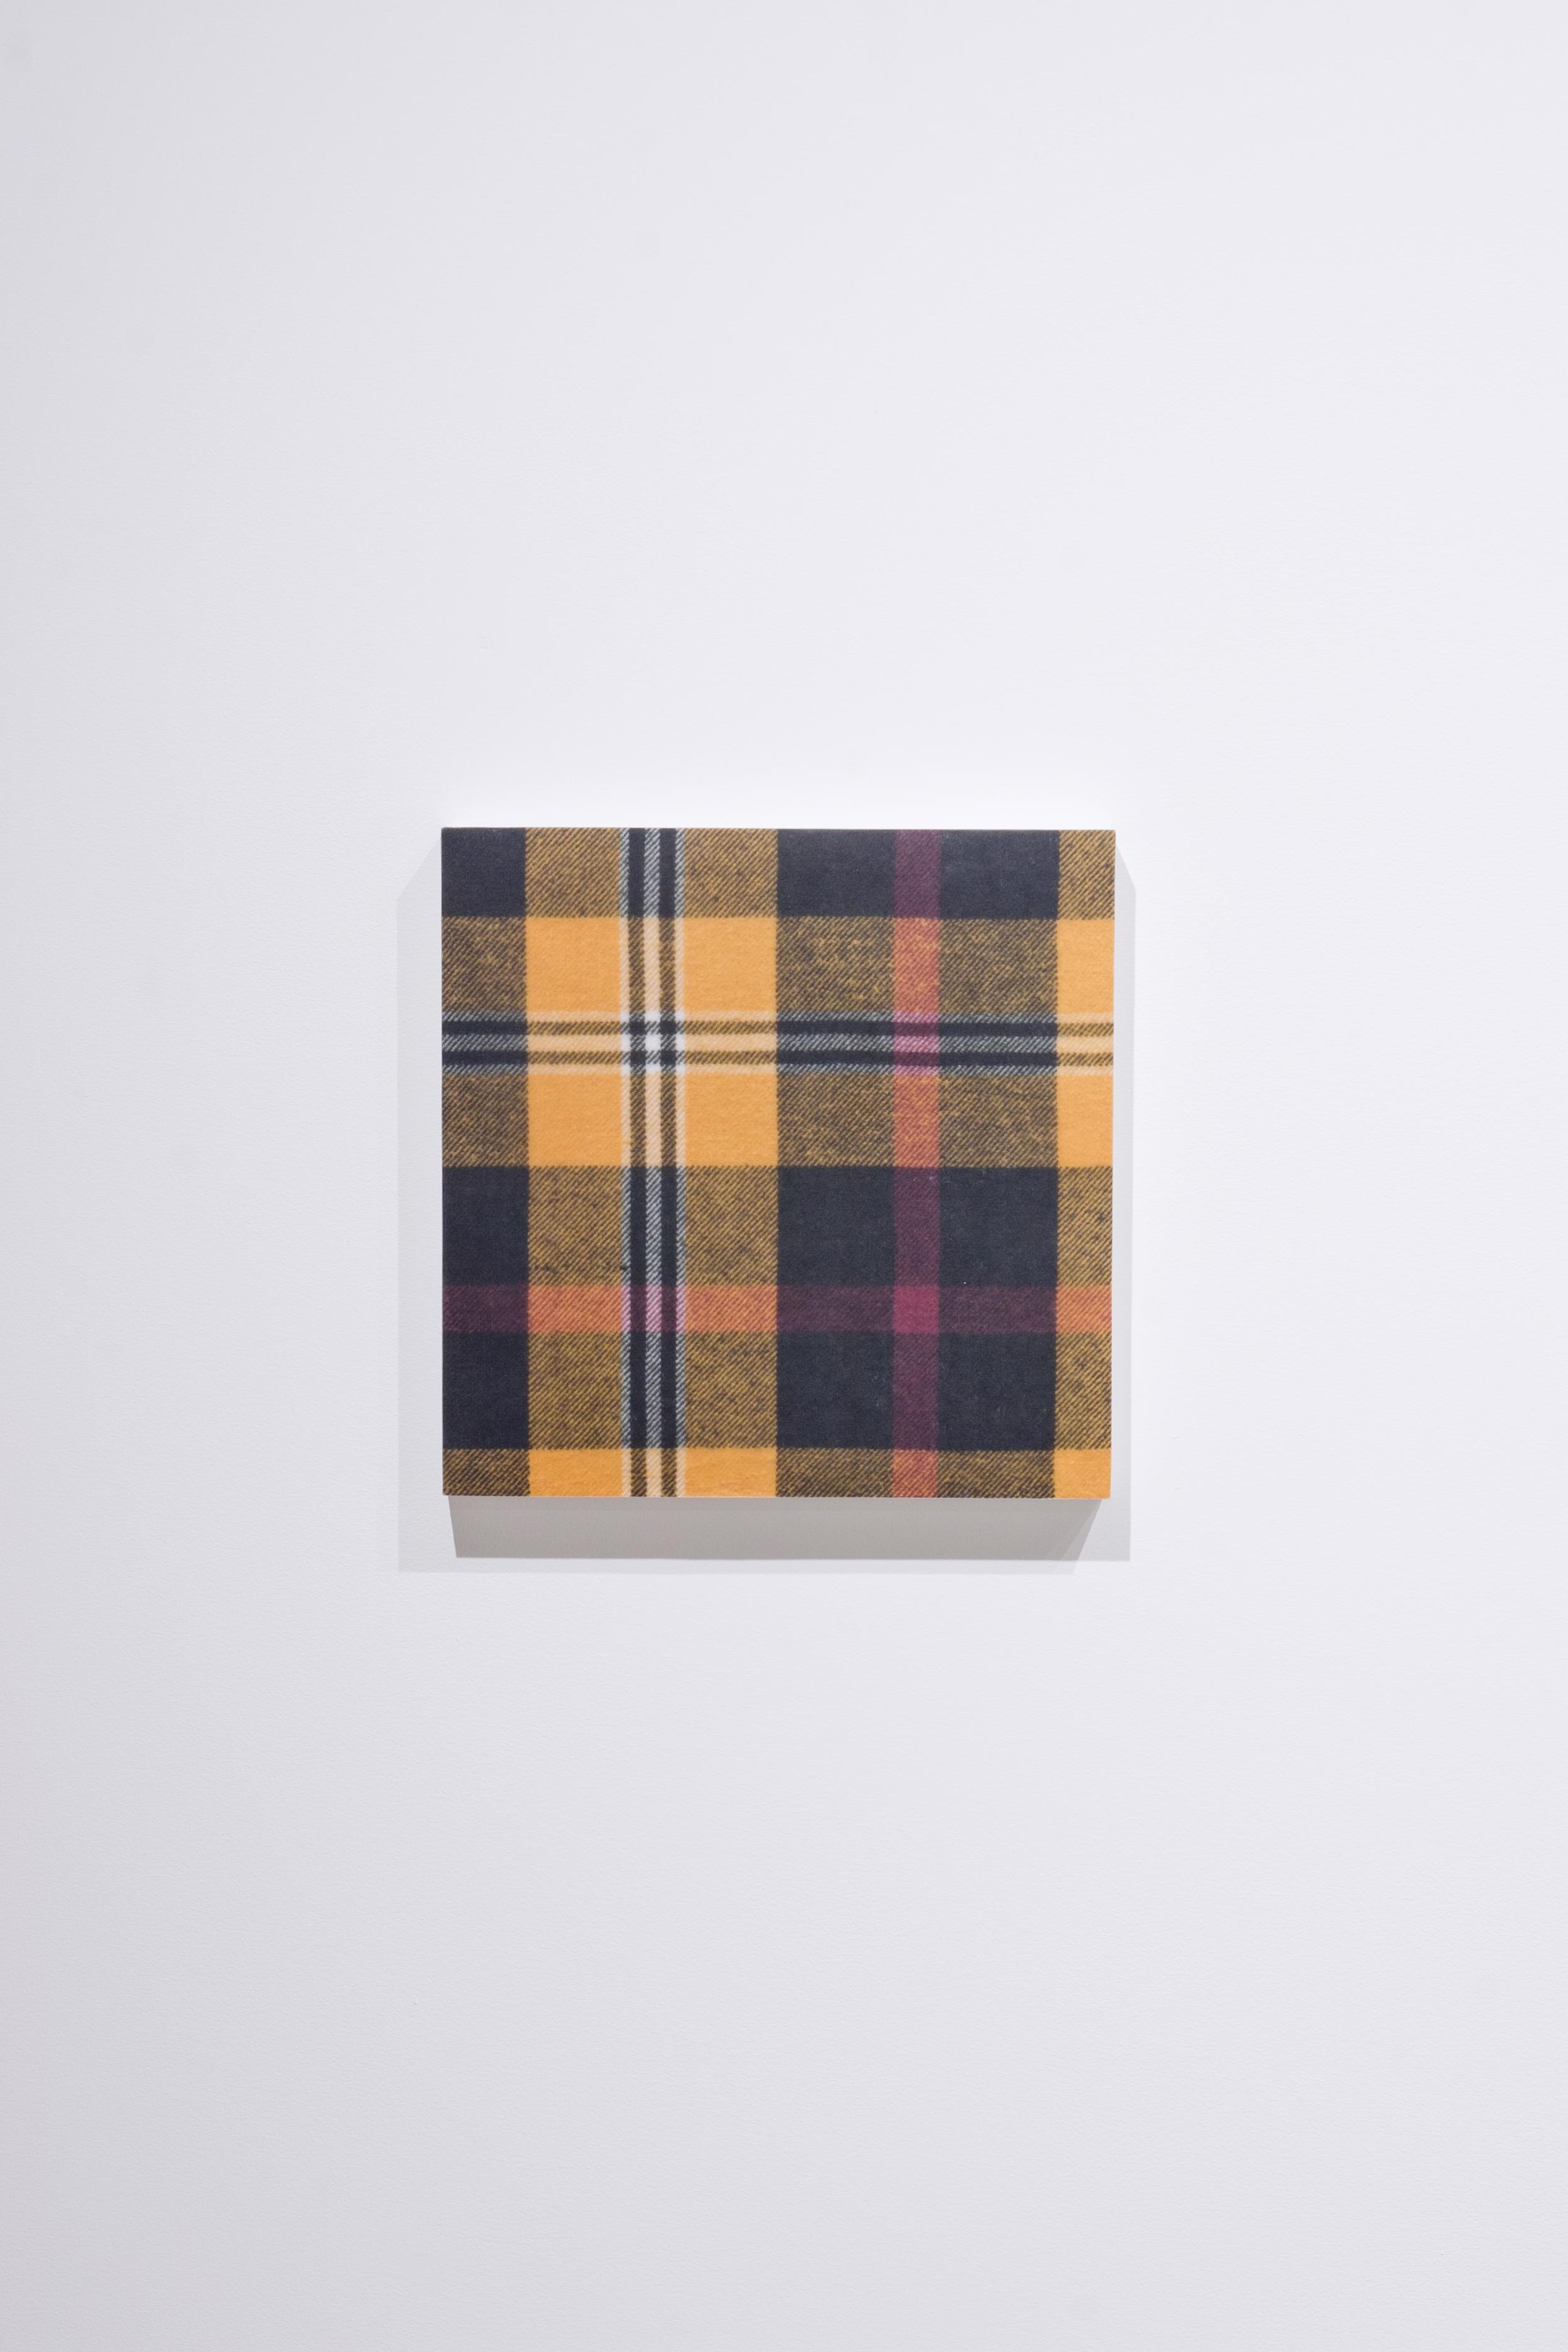 Shirt (Black and YellowFlannel) , 2015,gel medium transfer on panel,25.5 x 25.5 cm (10 x 10 in)